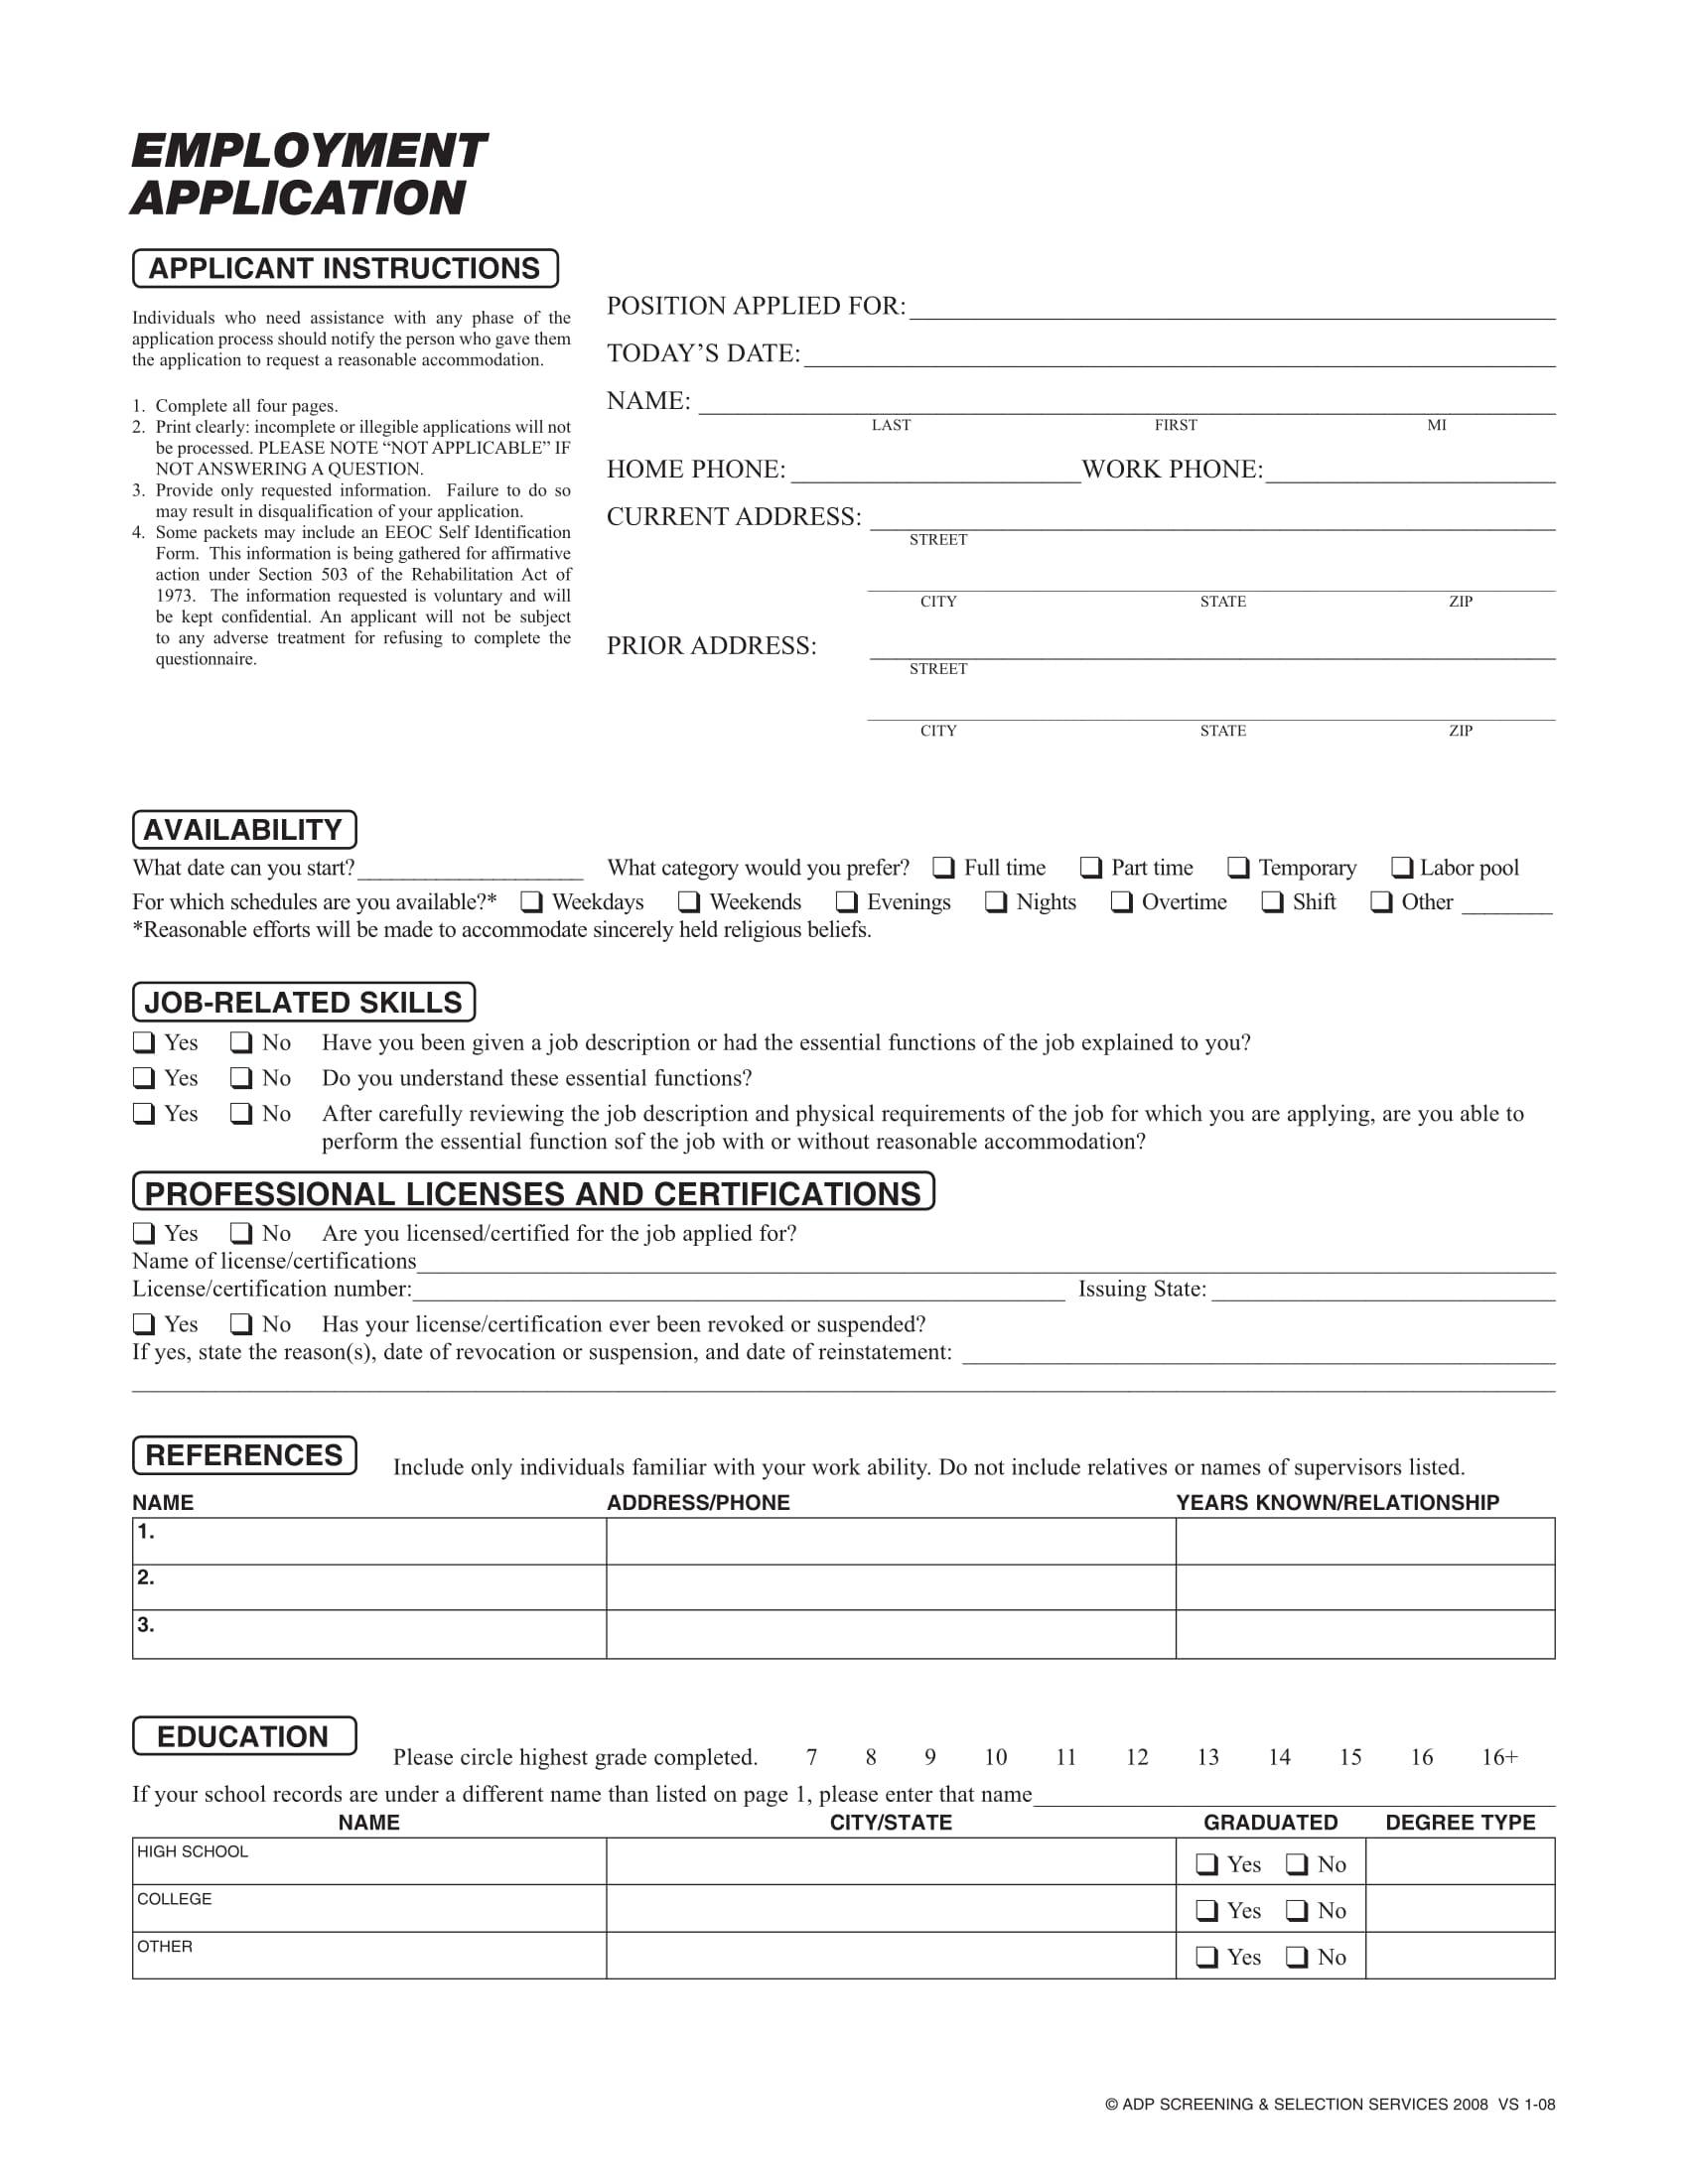 Employment Application Form Sample